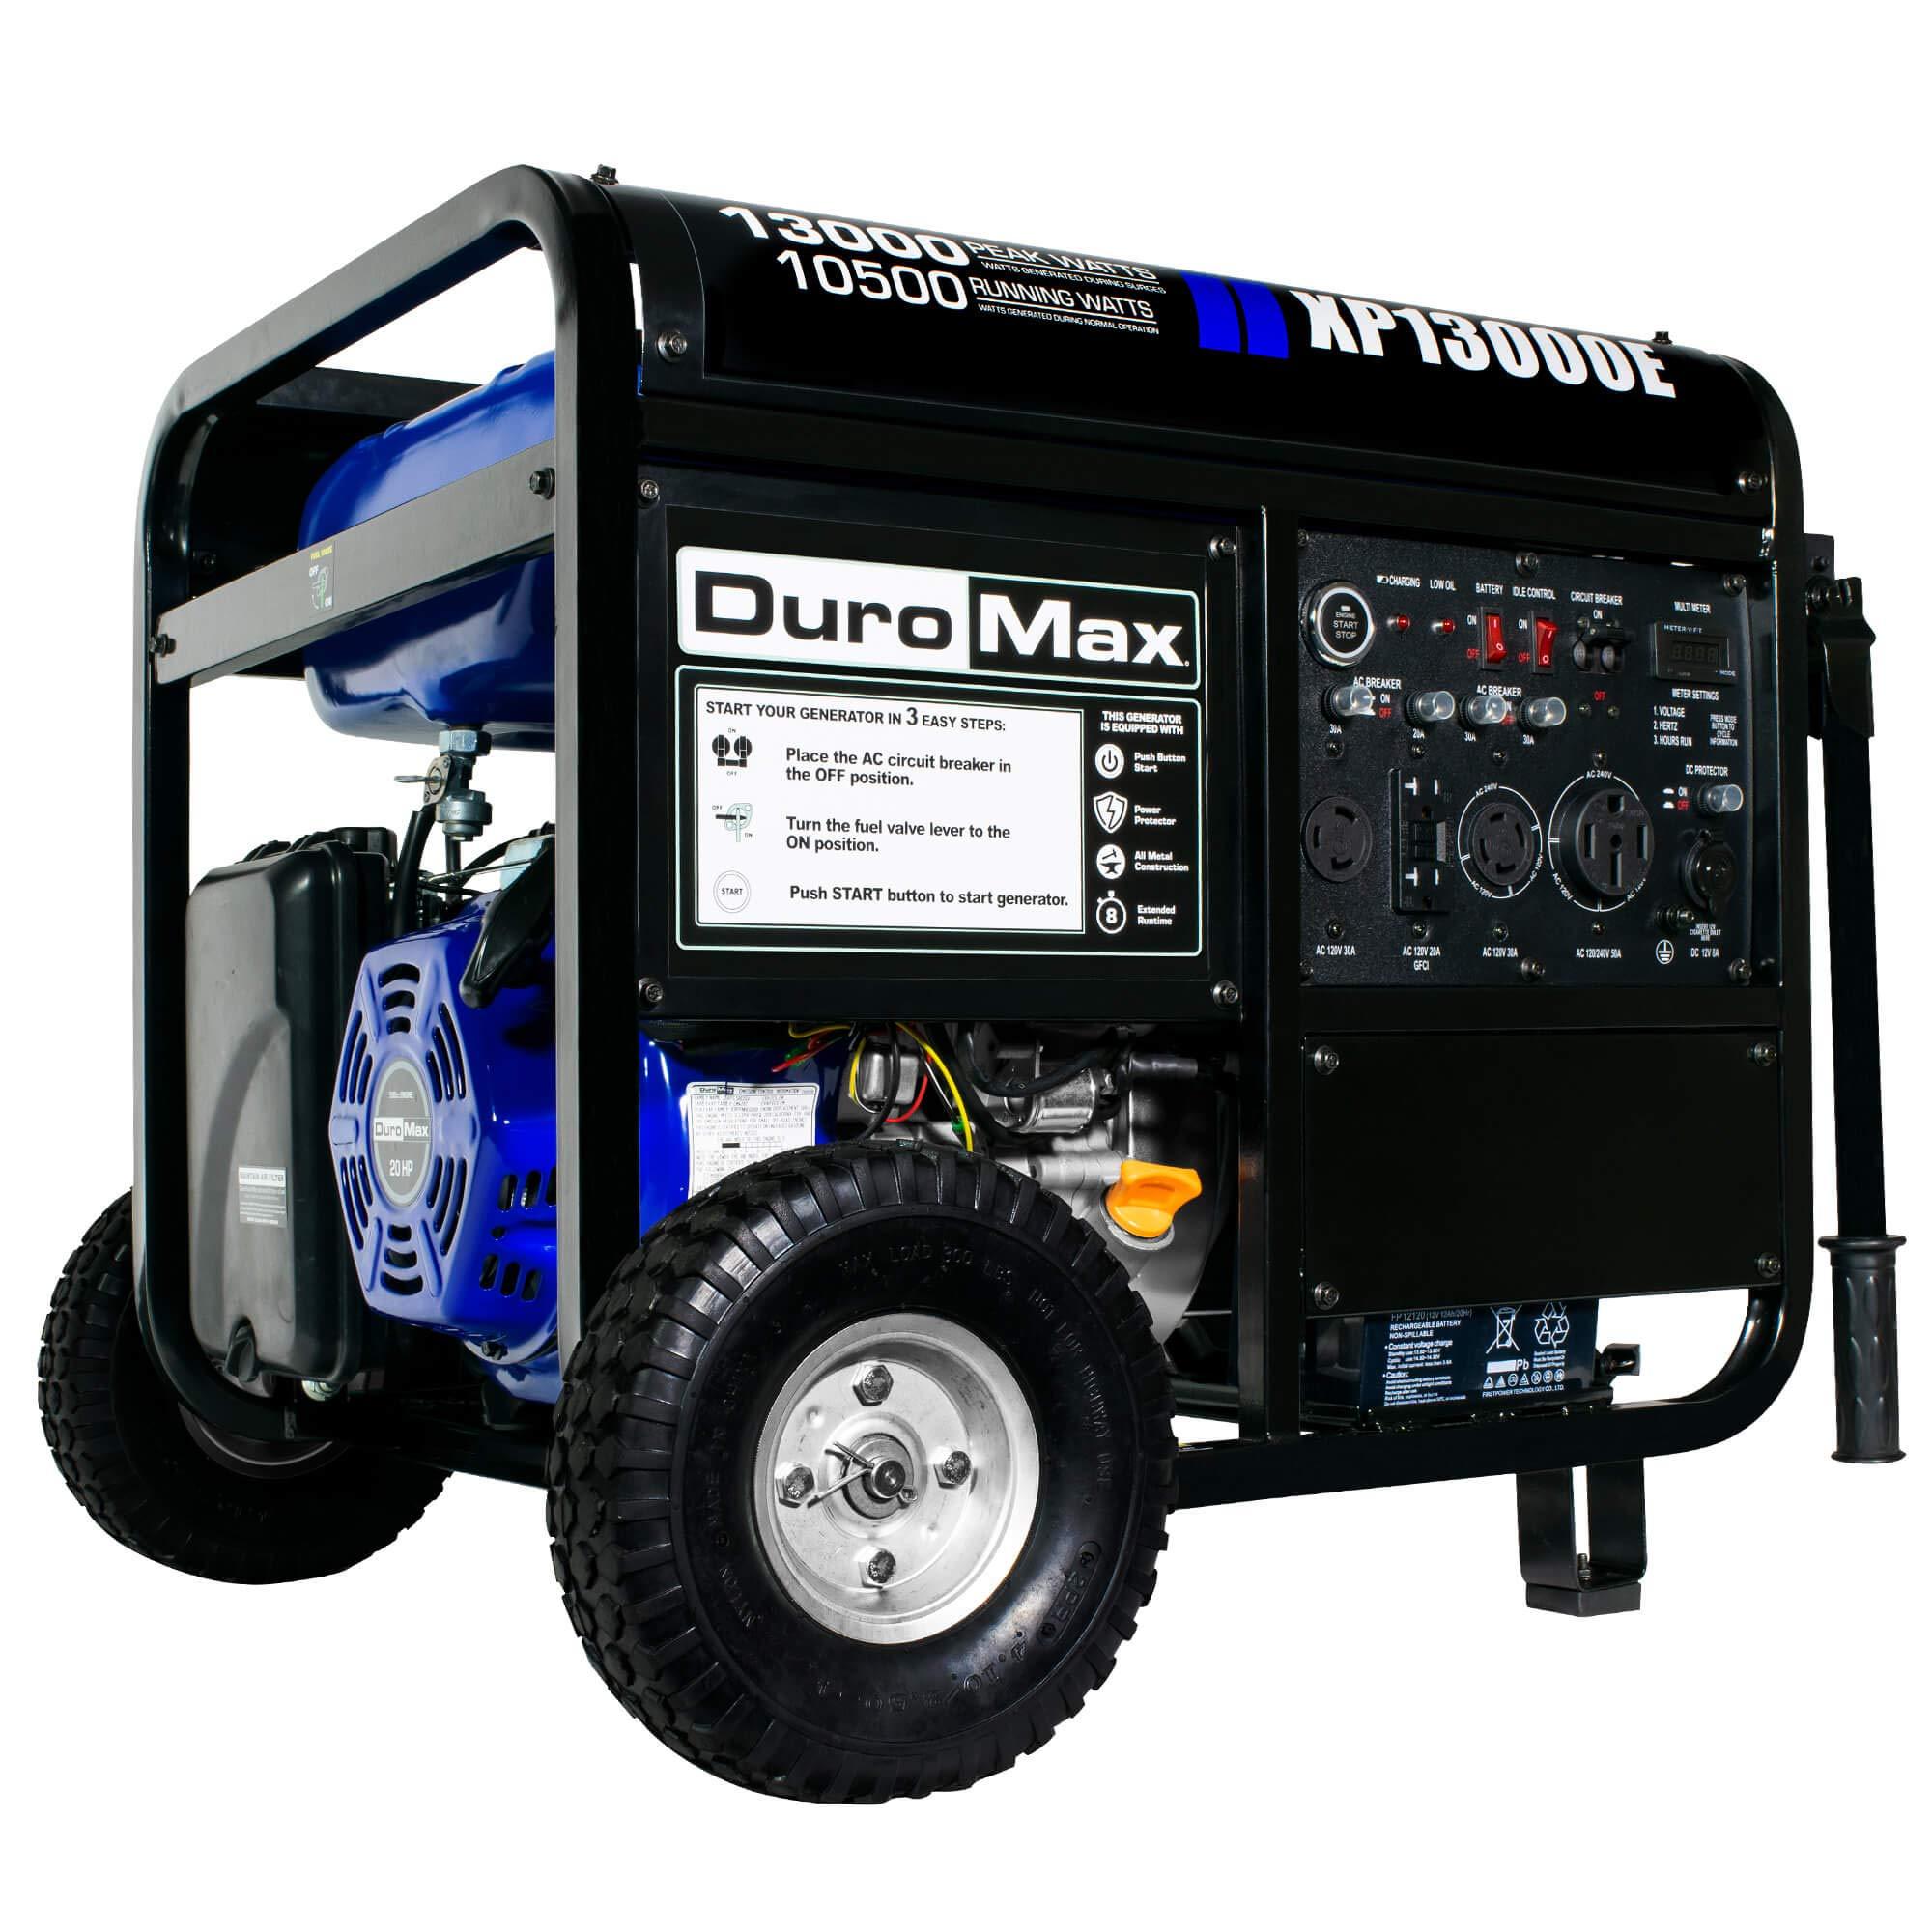 DuroMax XP13000E 13000 Watt Portable Gas Electric Start Generator